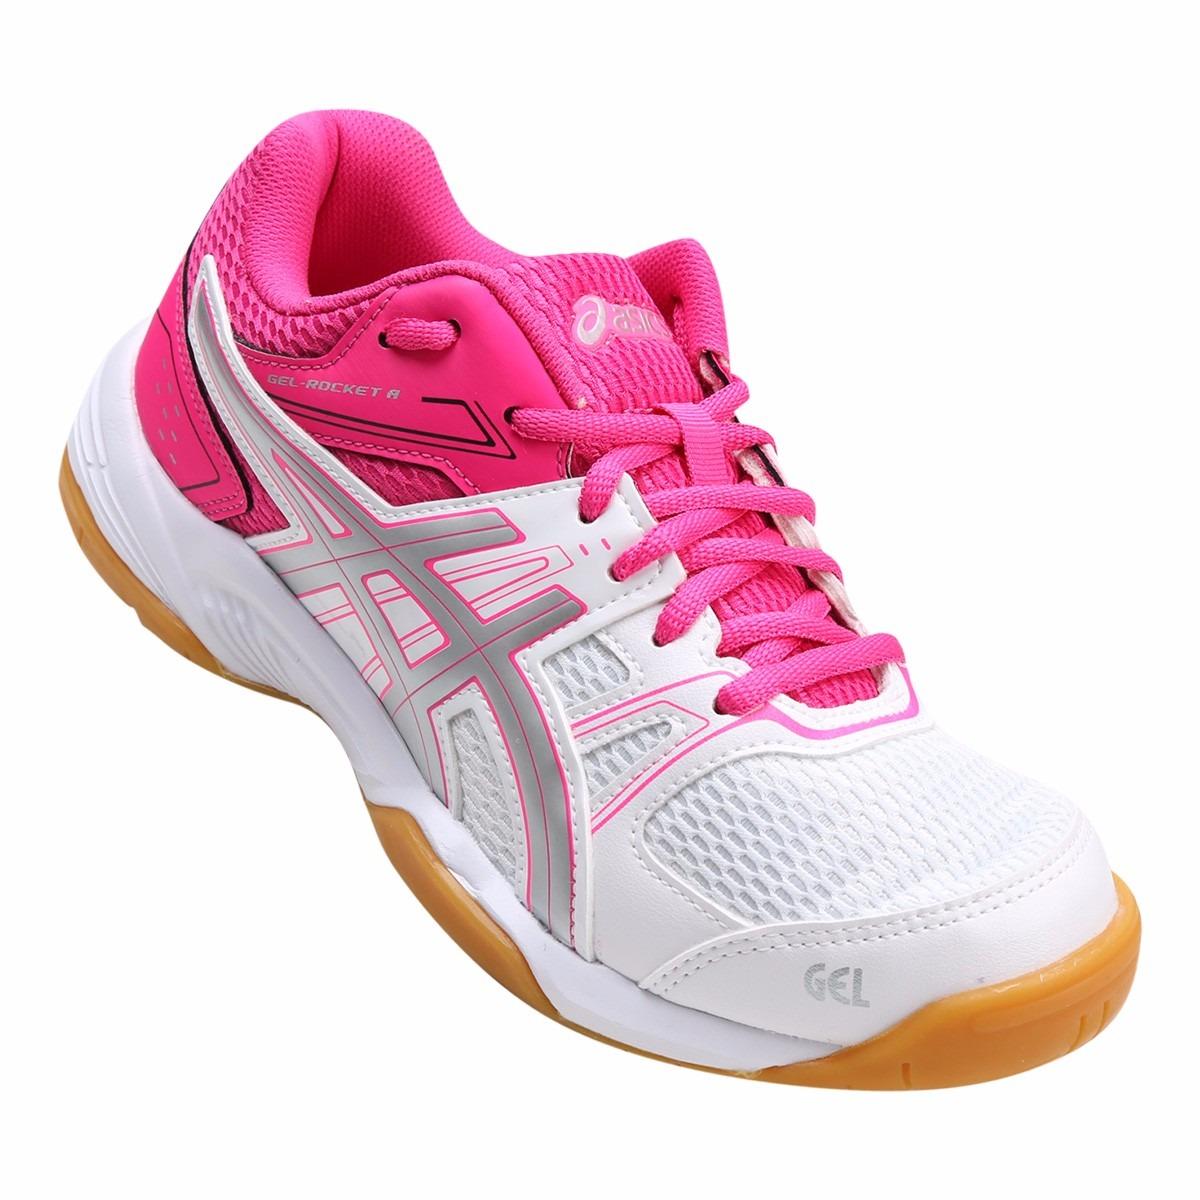 defb5f3c482 tênis asics gel rocket 7a feminino futsal handebol voleibol. Carregando  zoom.